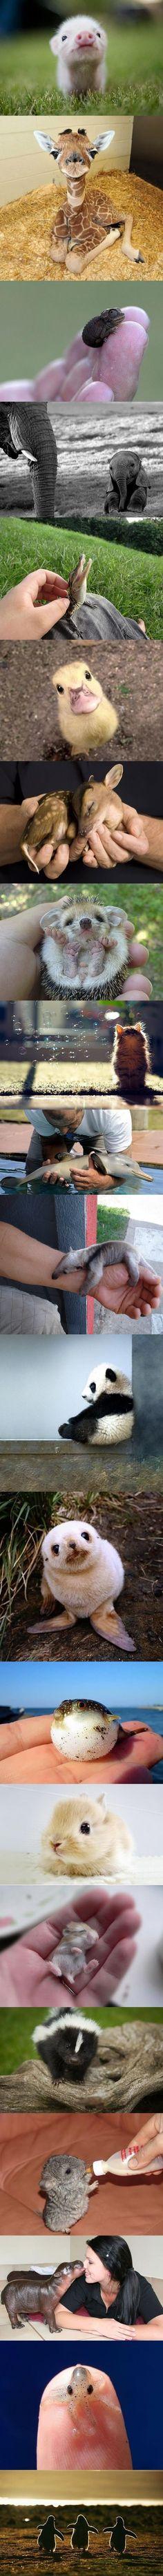 OMG!!!! SO SMALL AND PRECIOUS!!!!!